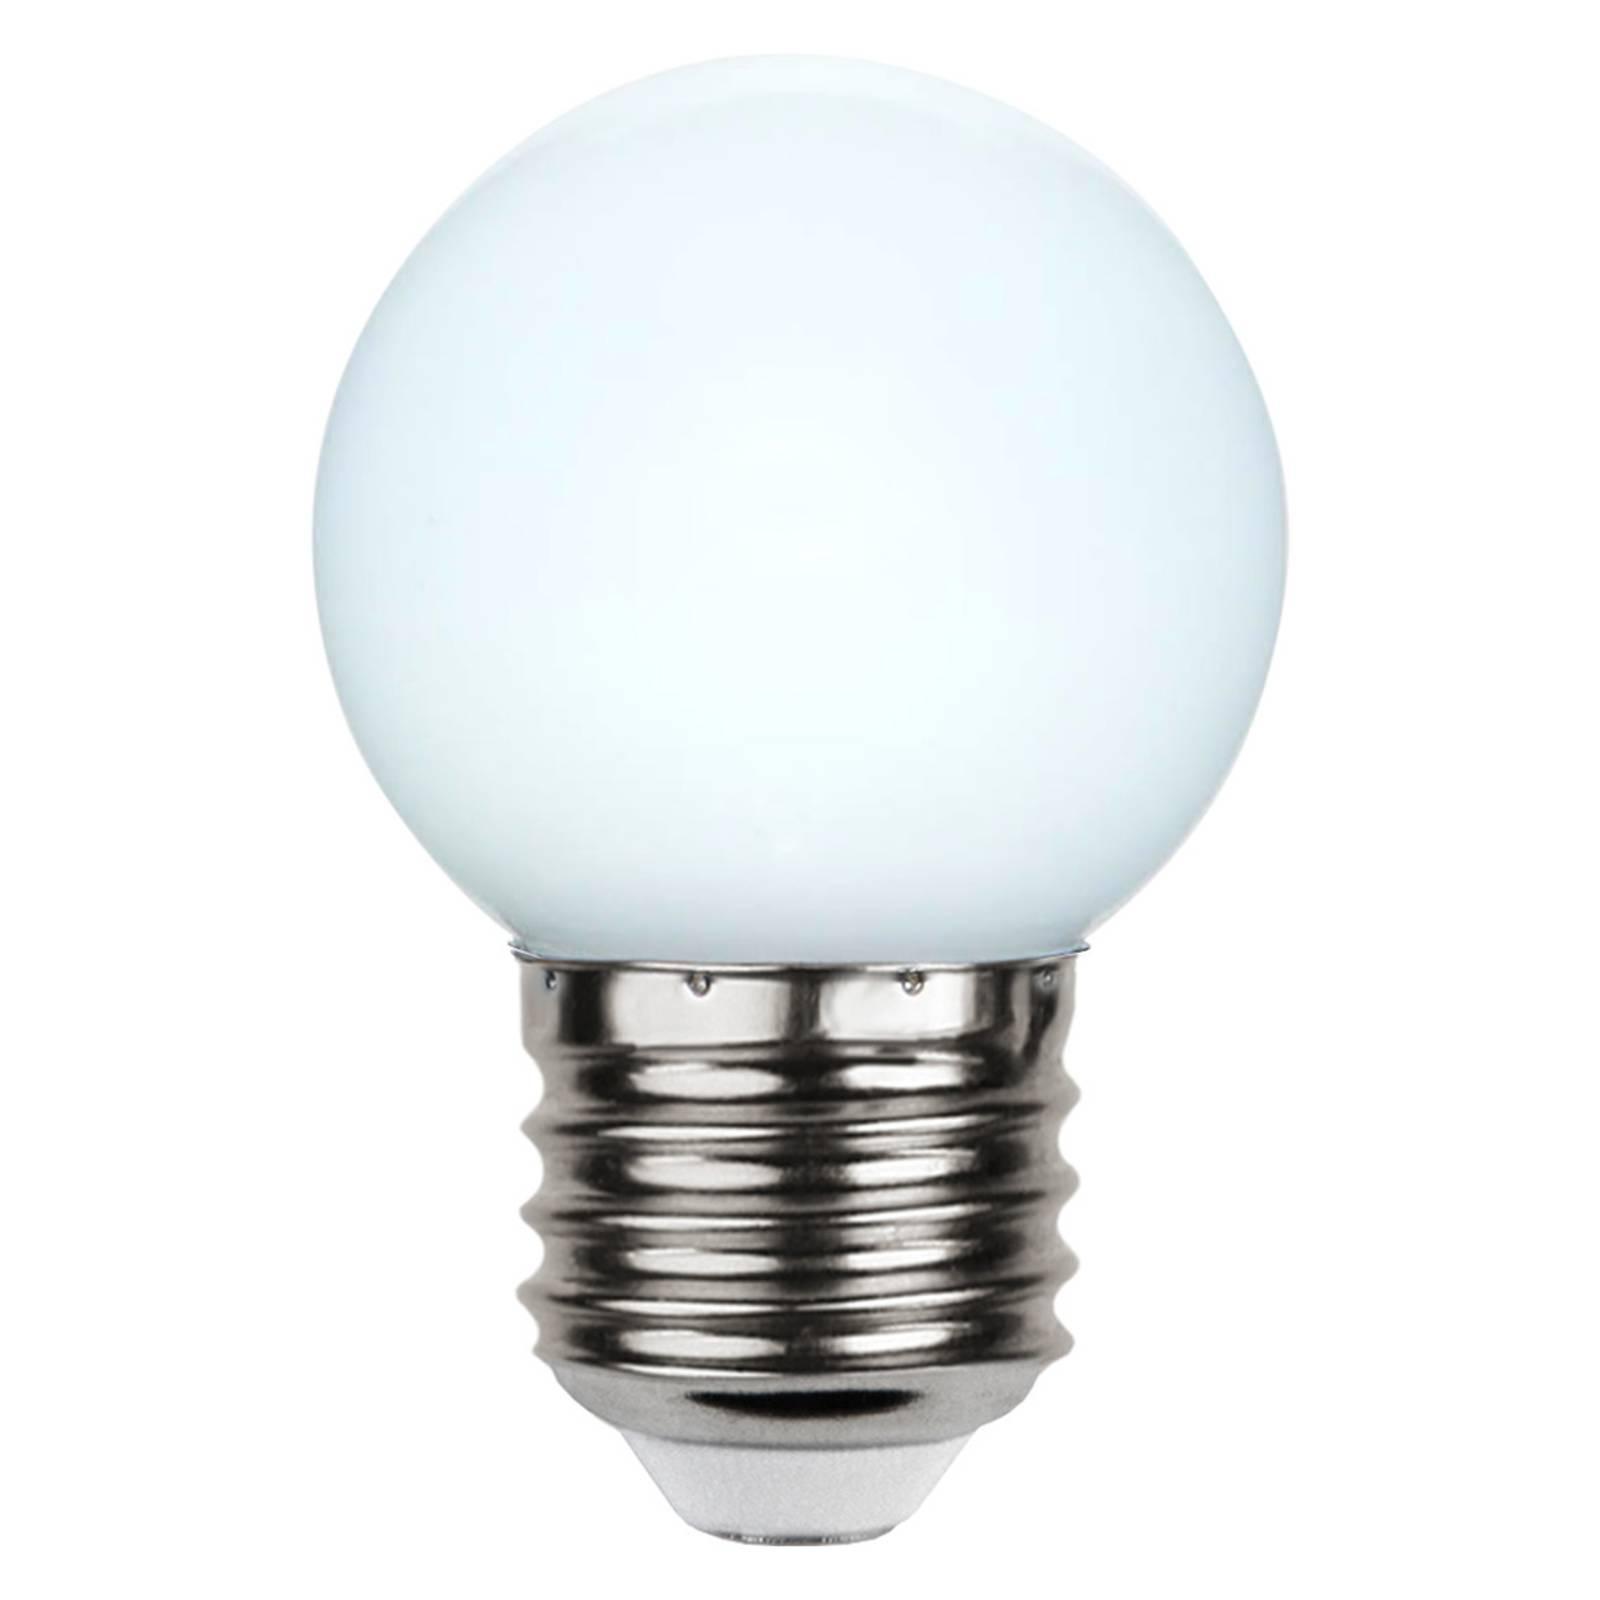 LED-lamppu E27 G45 valoketjuihin valkoinen 6 500 K